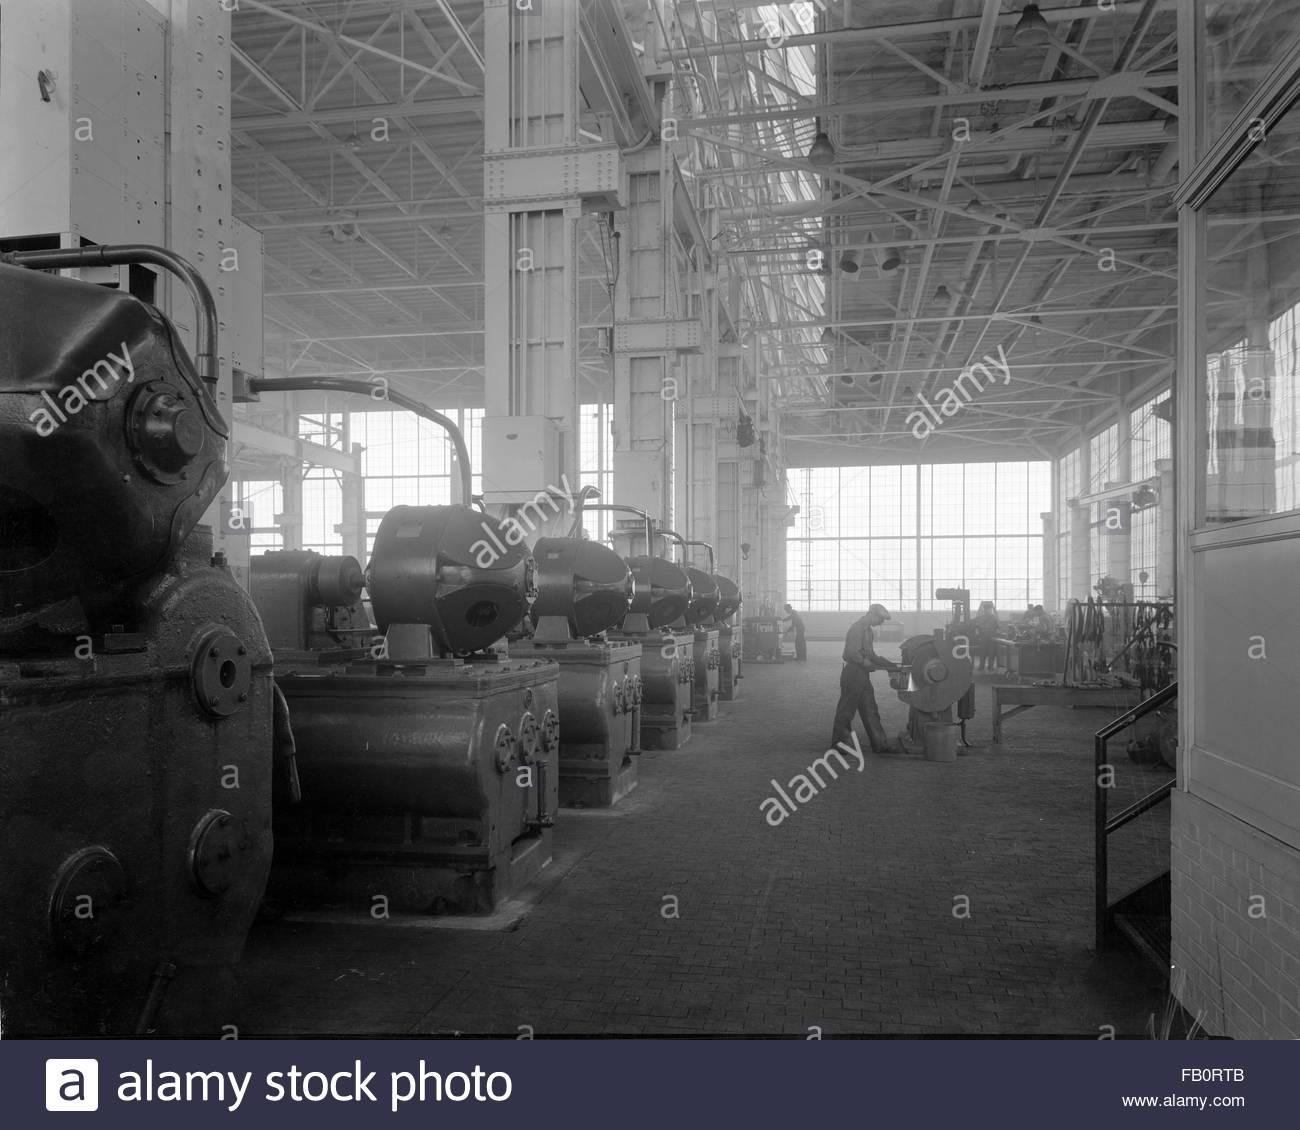 May 1940 Stockfotos & May 1940 Bilder - Alamy